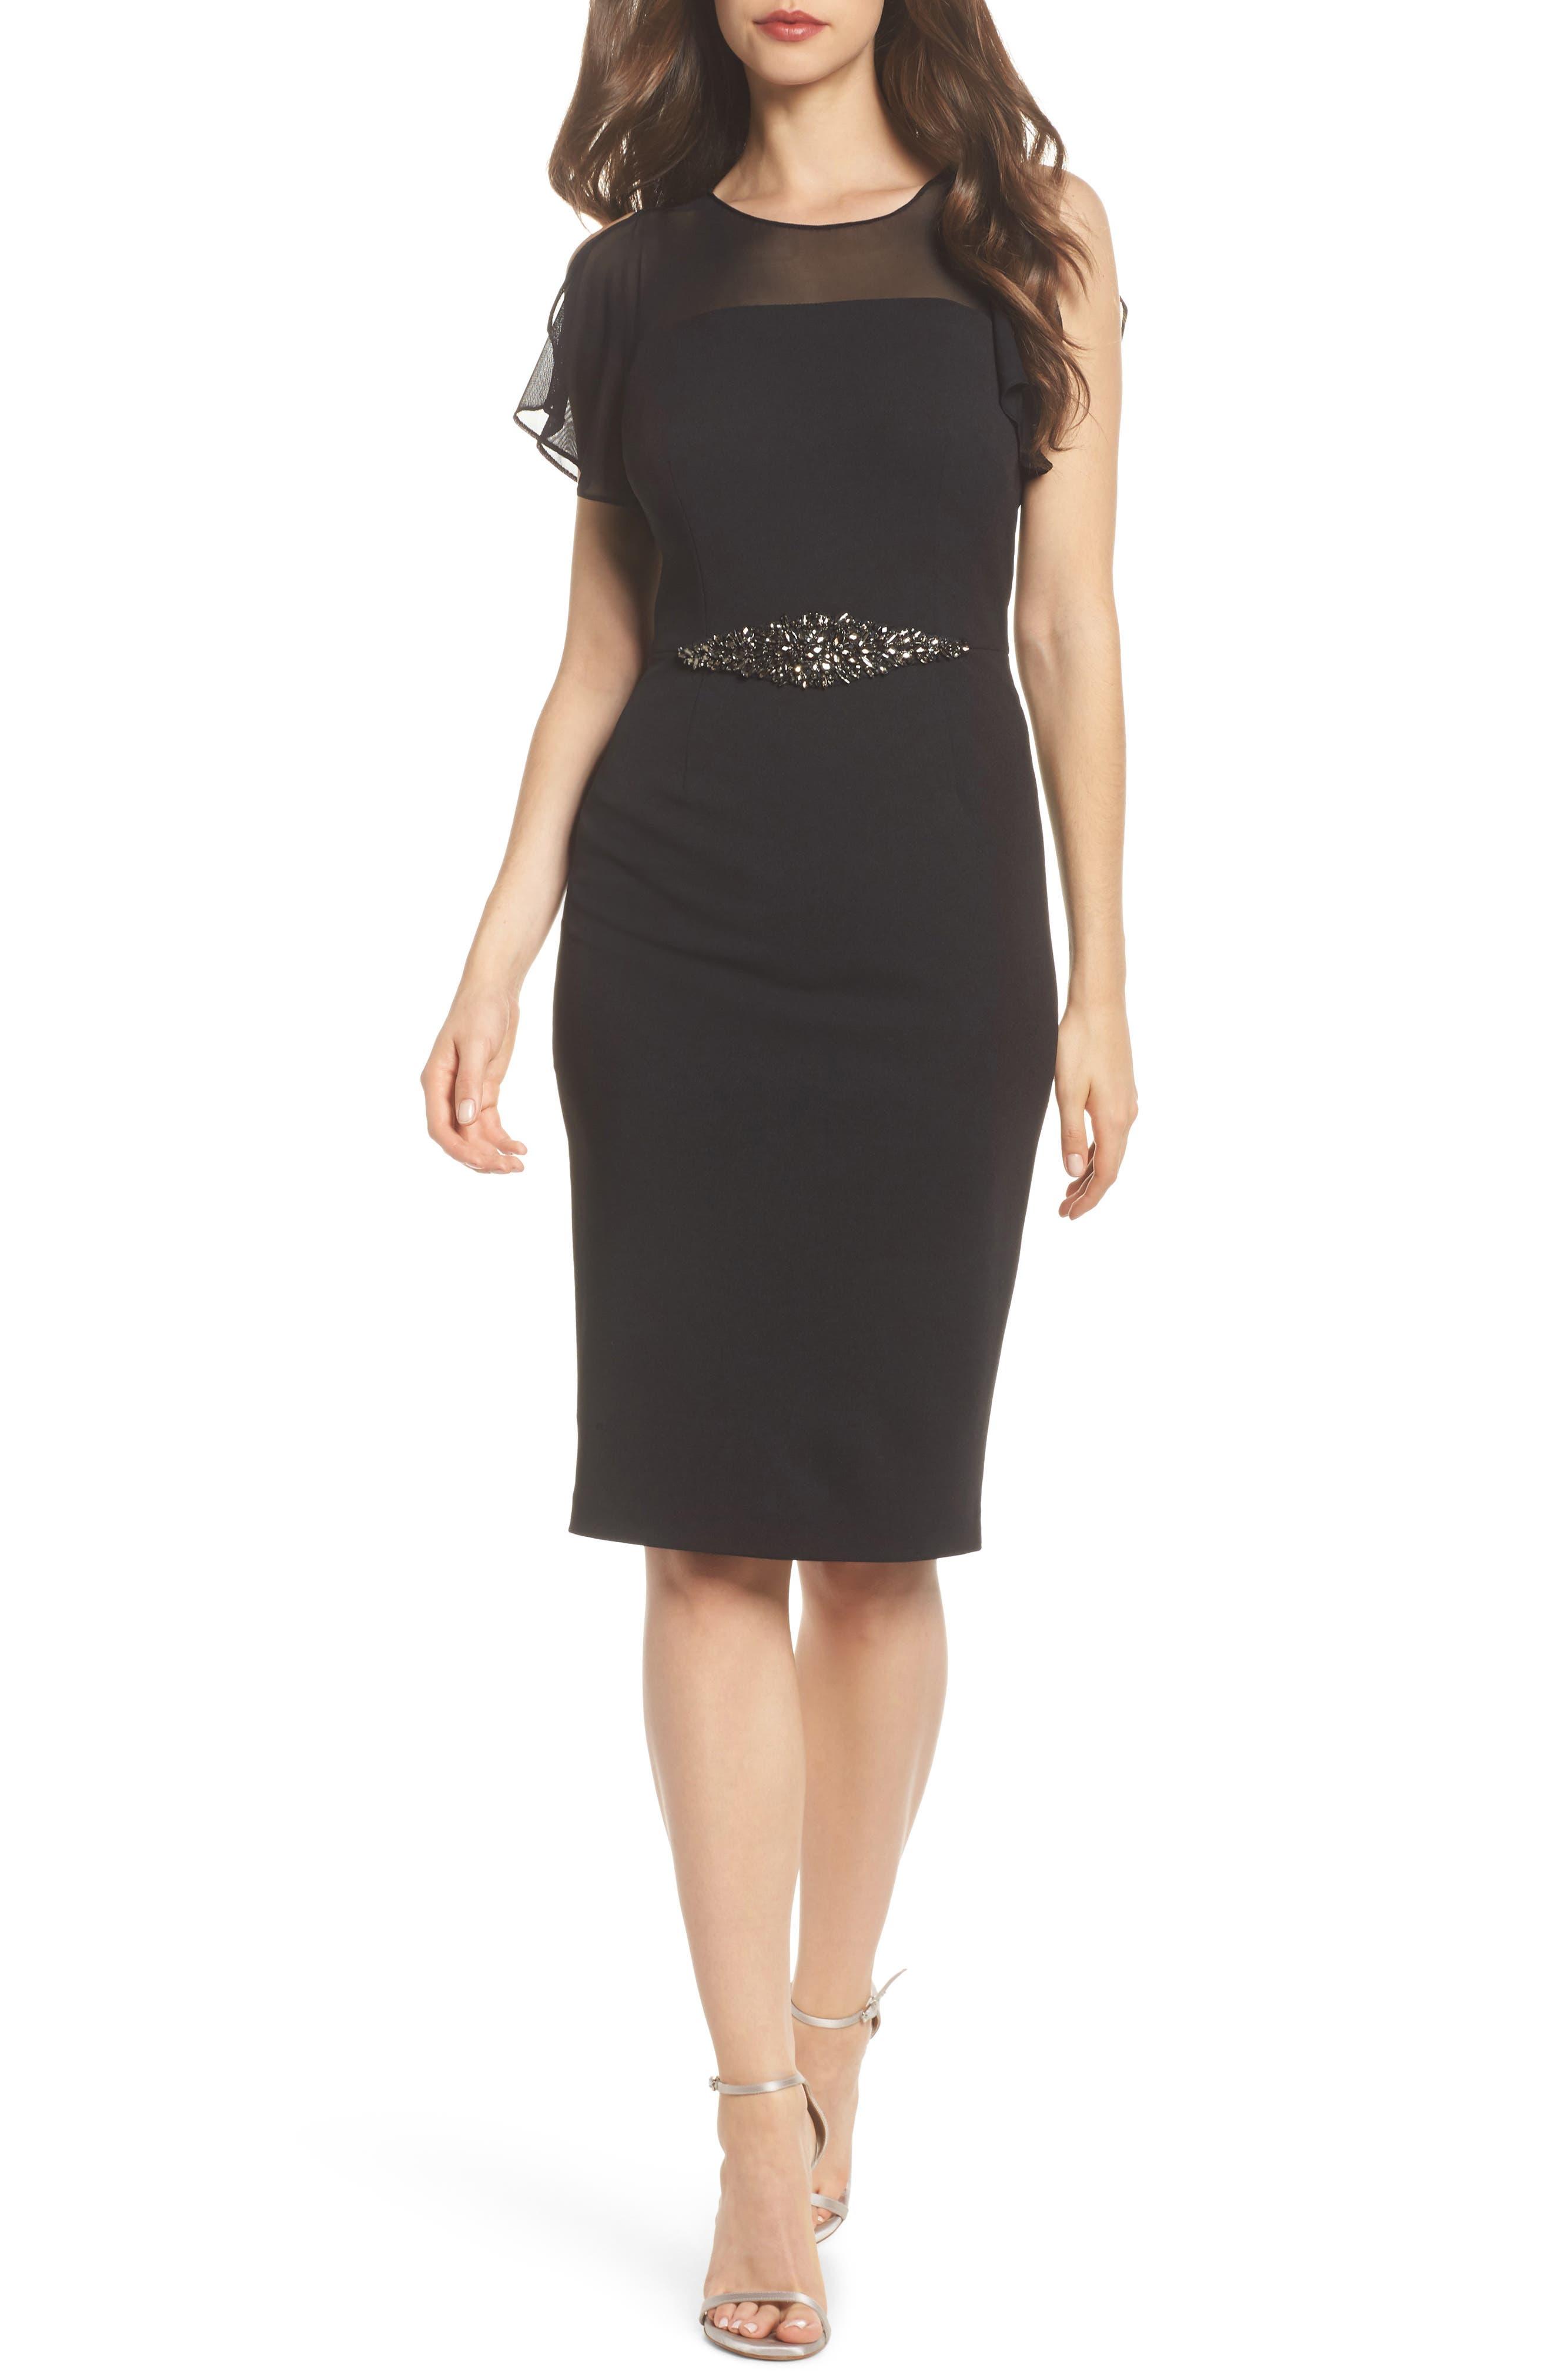 Adrianna Papell Embellished Crepe Sheath Dress